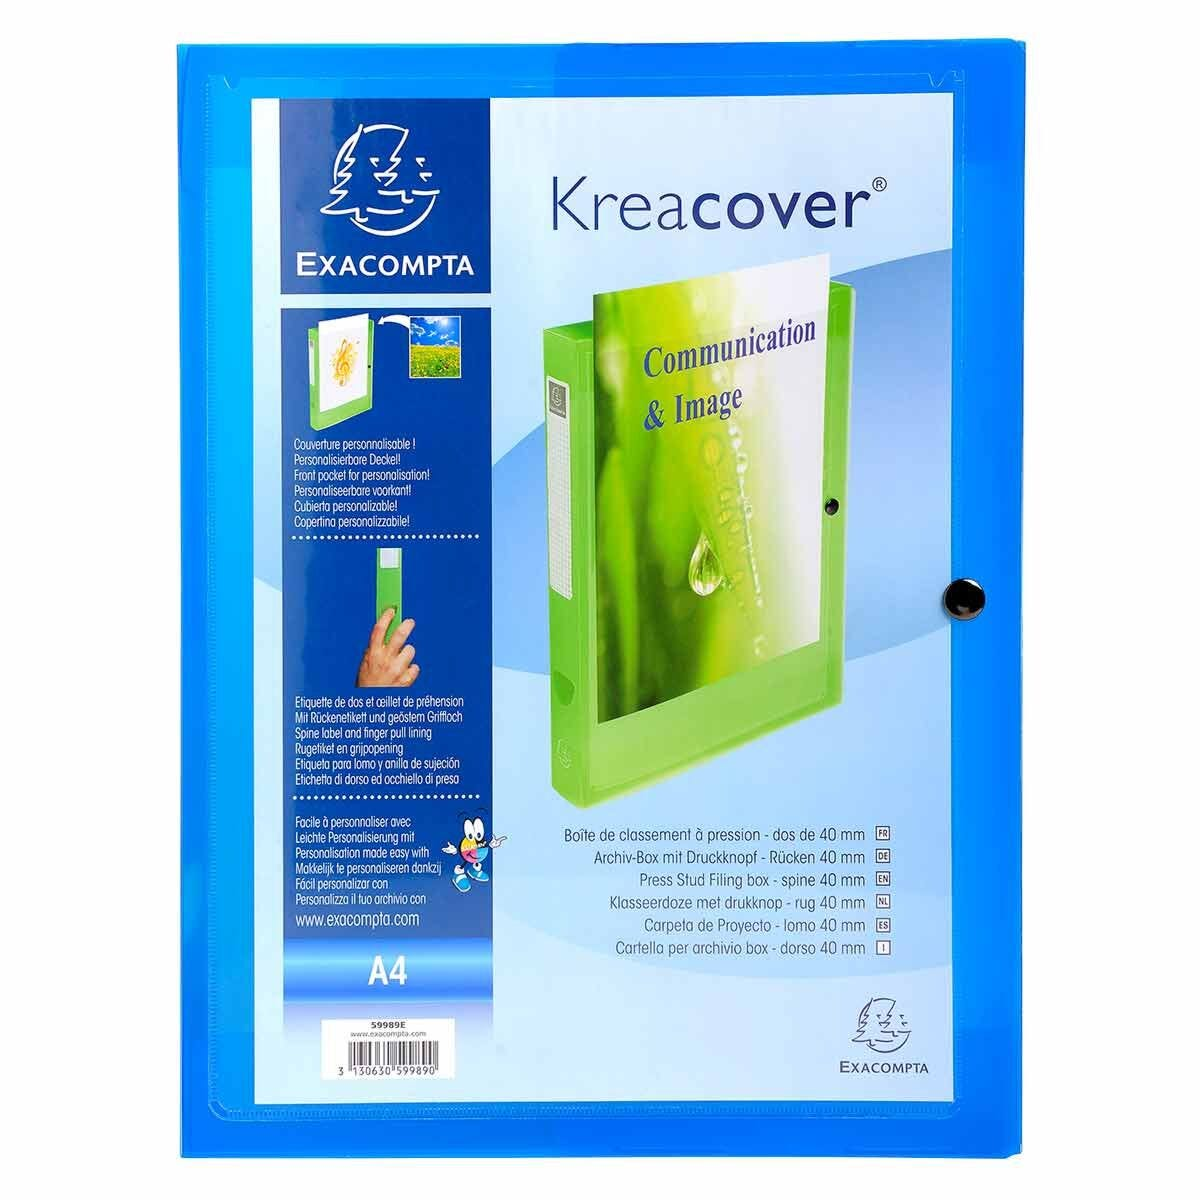 Exacompta 5 x Sammelbox Kreacover 40mm PP transparent blau